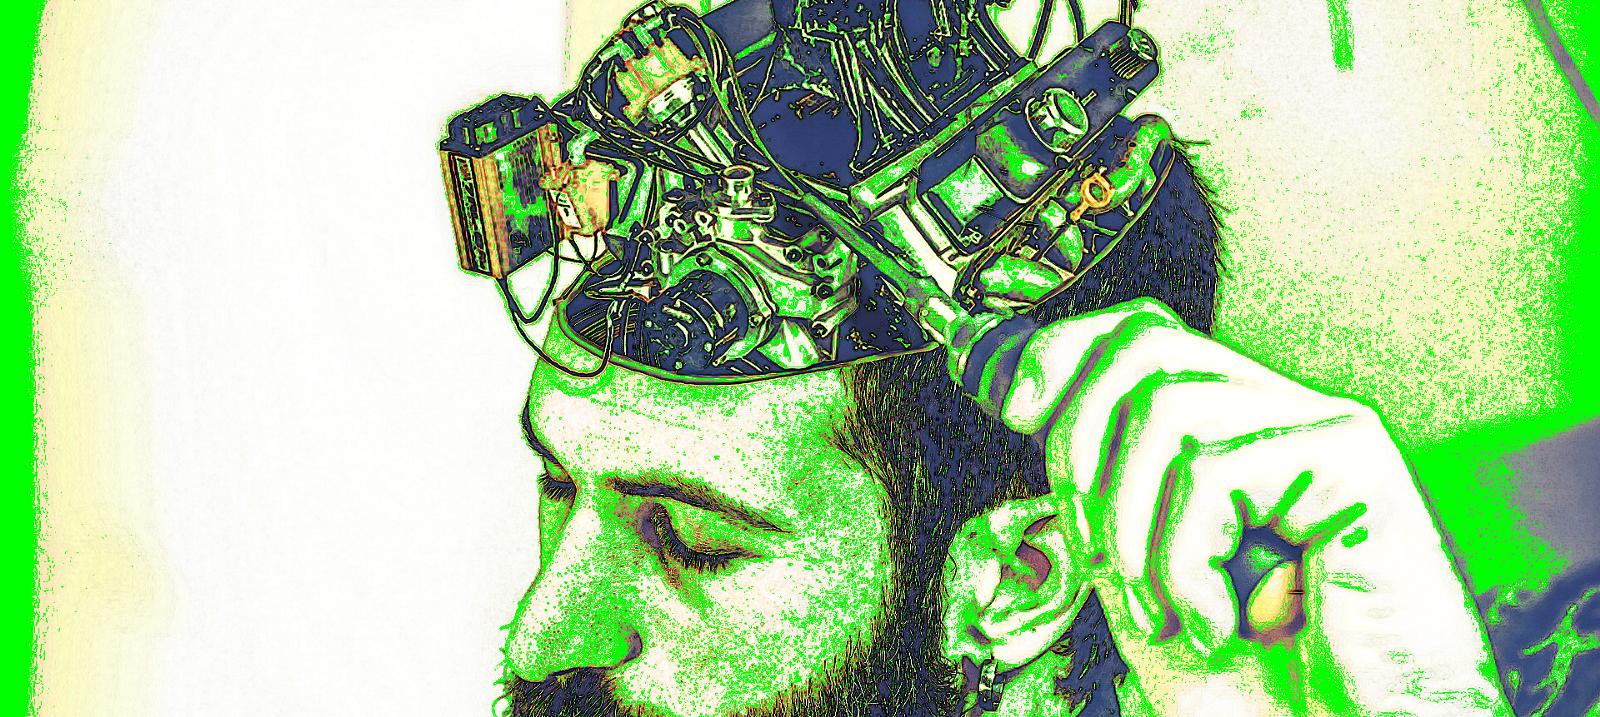 /simple-math-problems-the-human-brain-vs-the-supercomputer-3635bdecc9e3 feature image